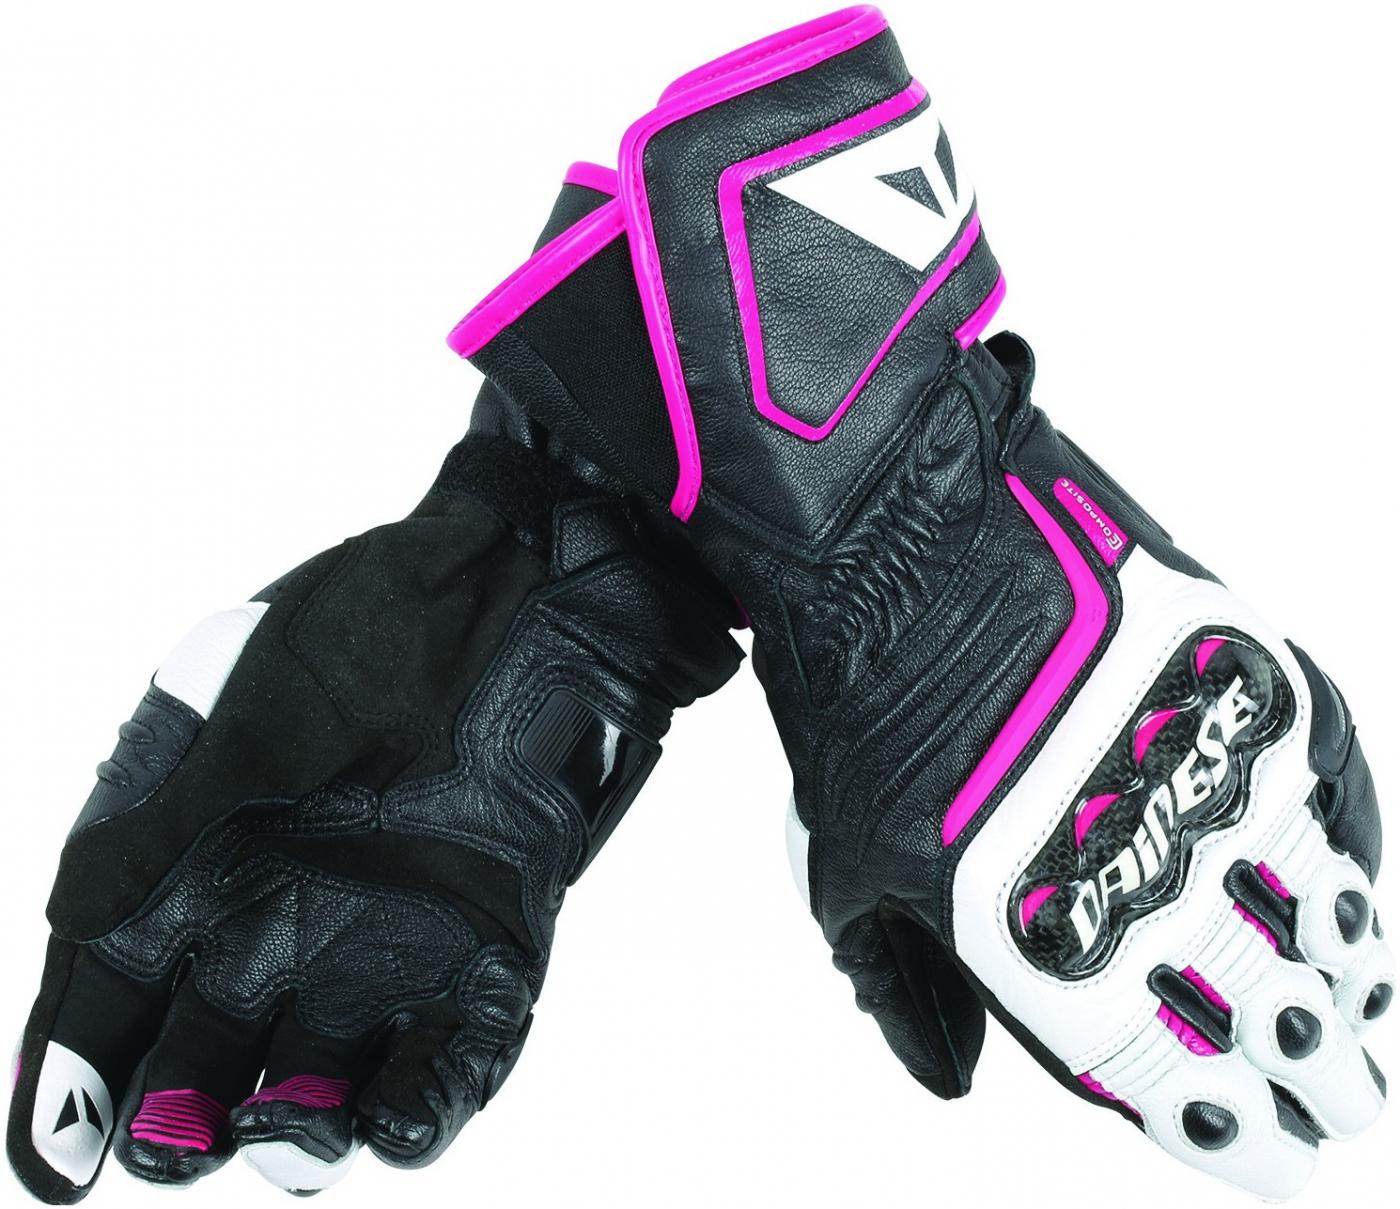 DAINESE rukavice CARBON D1 LONG dámské black white fuchsia  710b0ee541